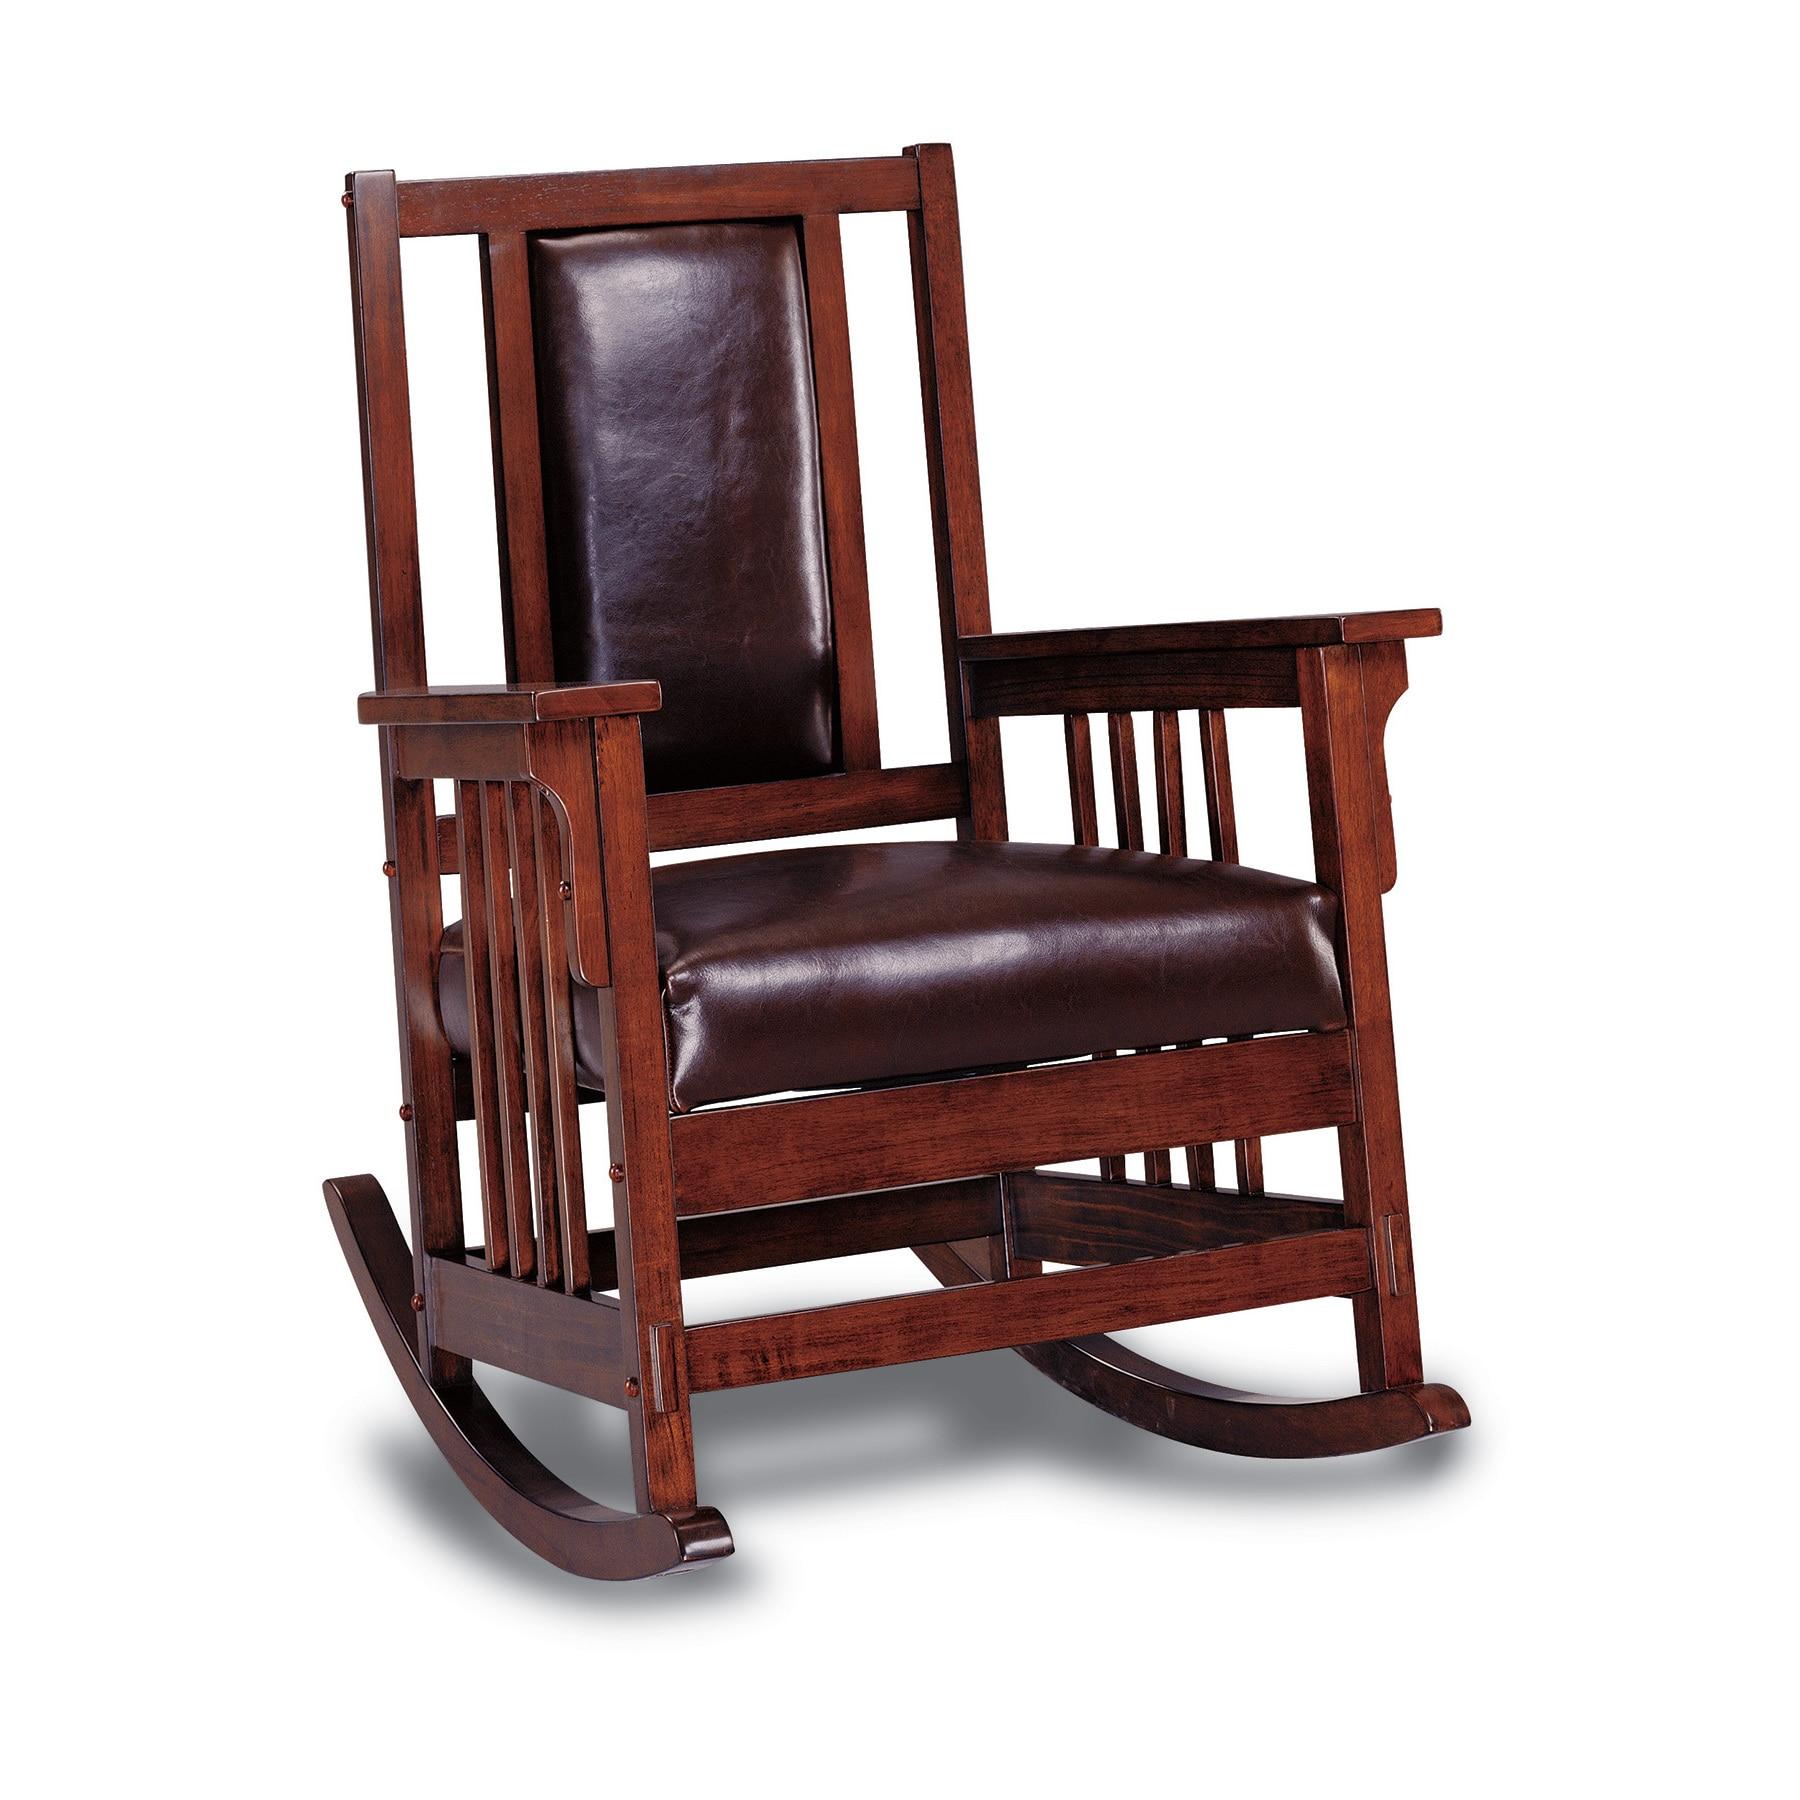 Coaster Furniture Dark Oak Wood Padded Leather Rocker Cha...